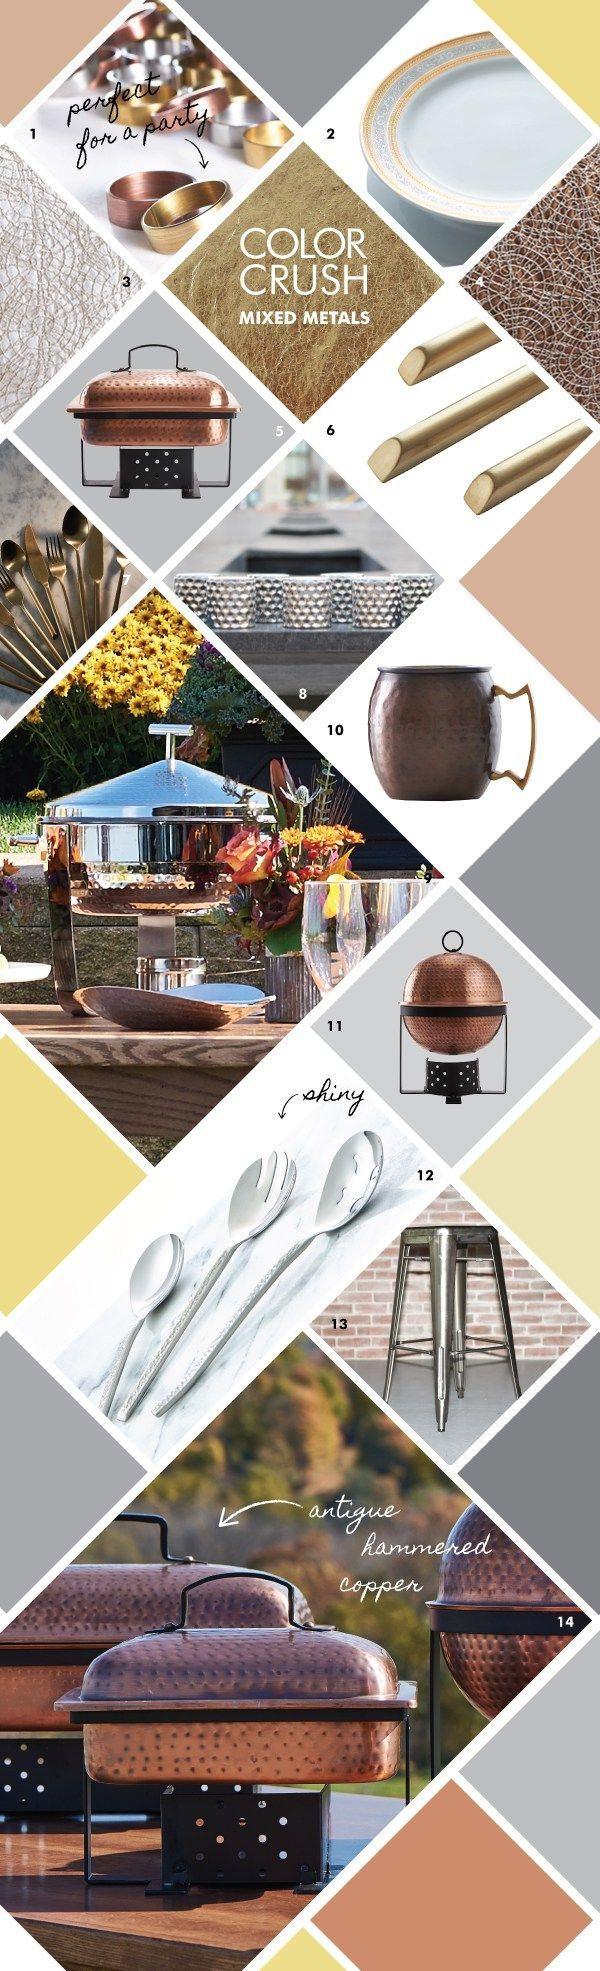 131 best metallic event design images on pinterest | event design